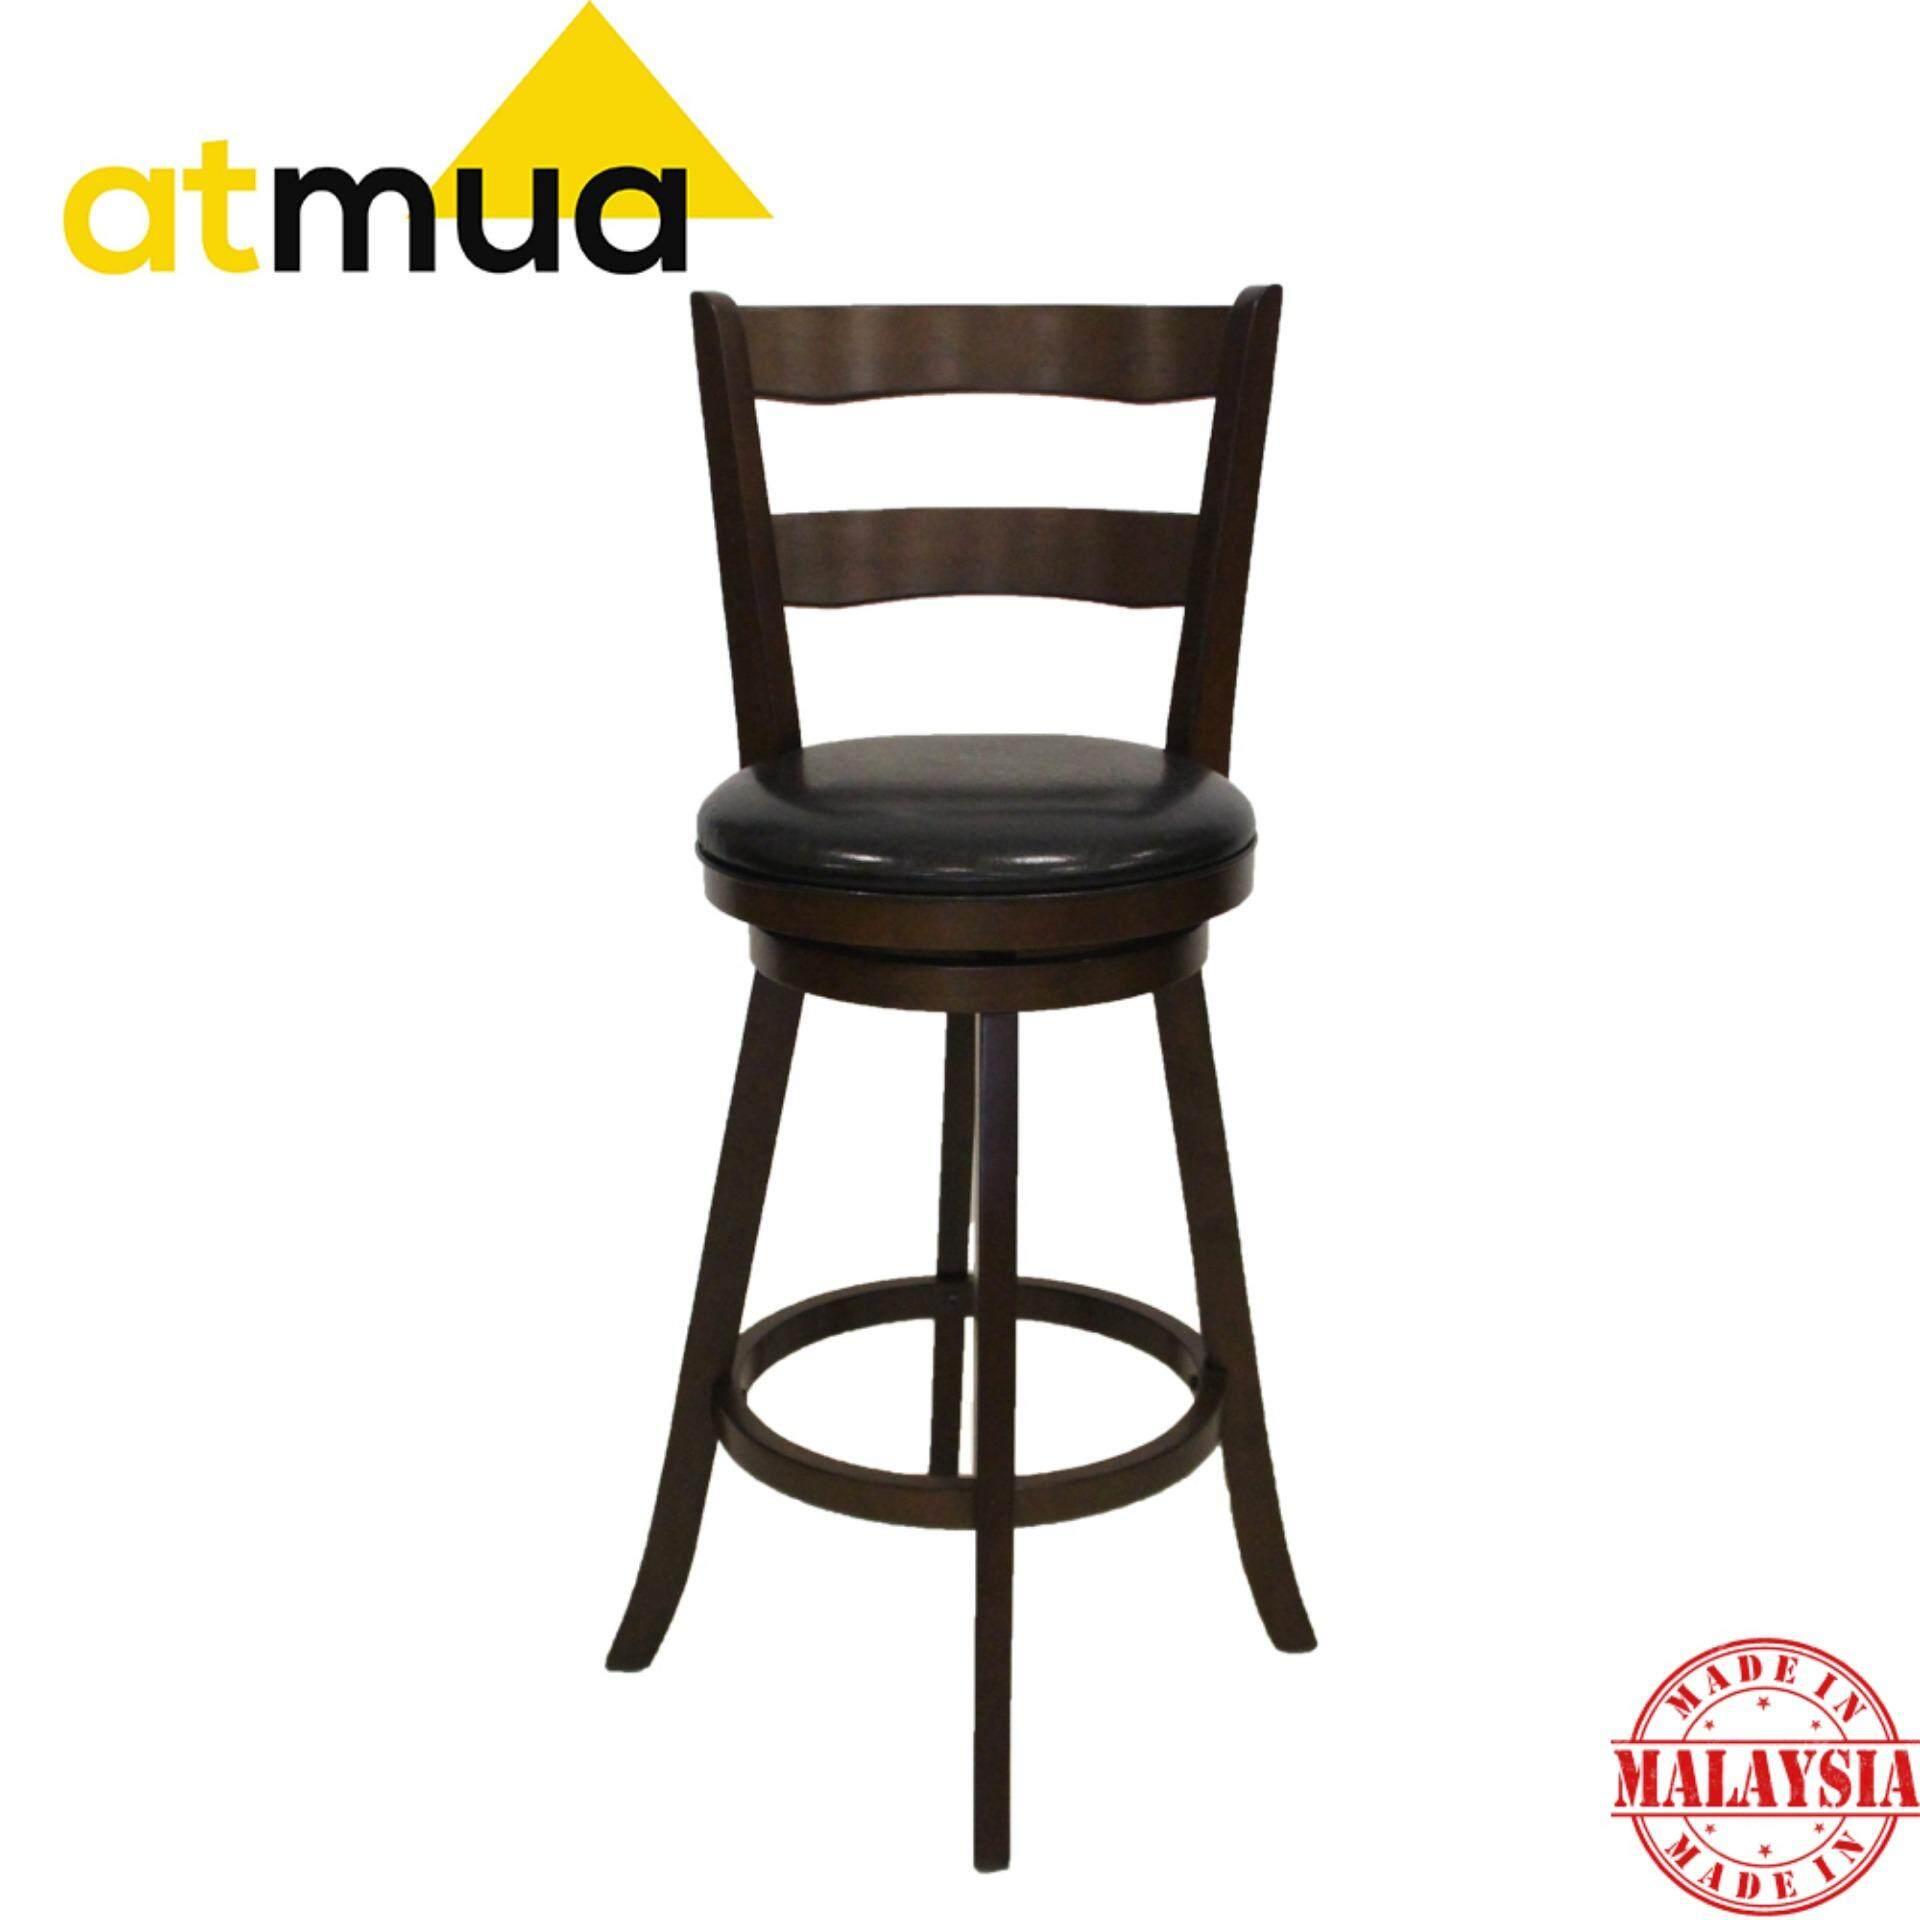 Atmua Estima 360 Swivel Bar Chair - Height 29 inch [Full Solid Wood]